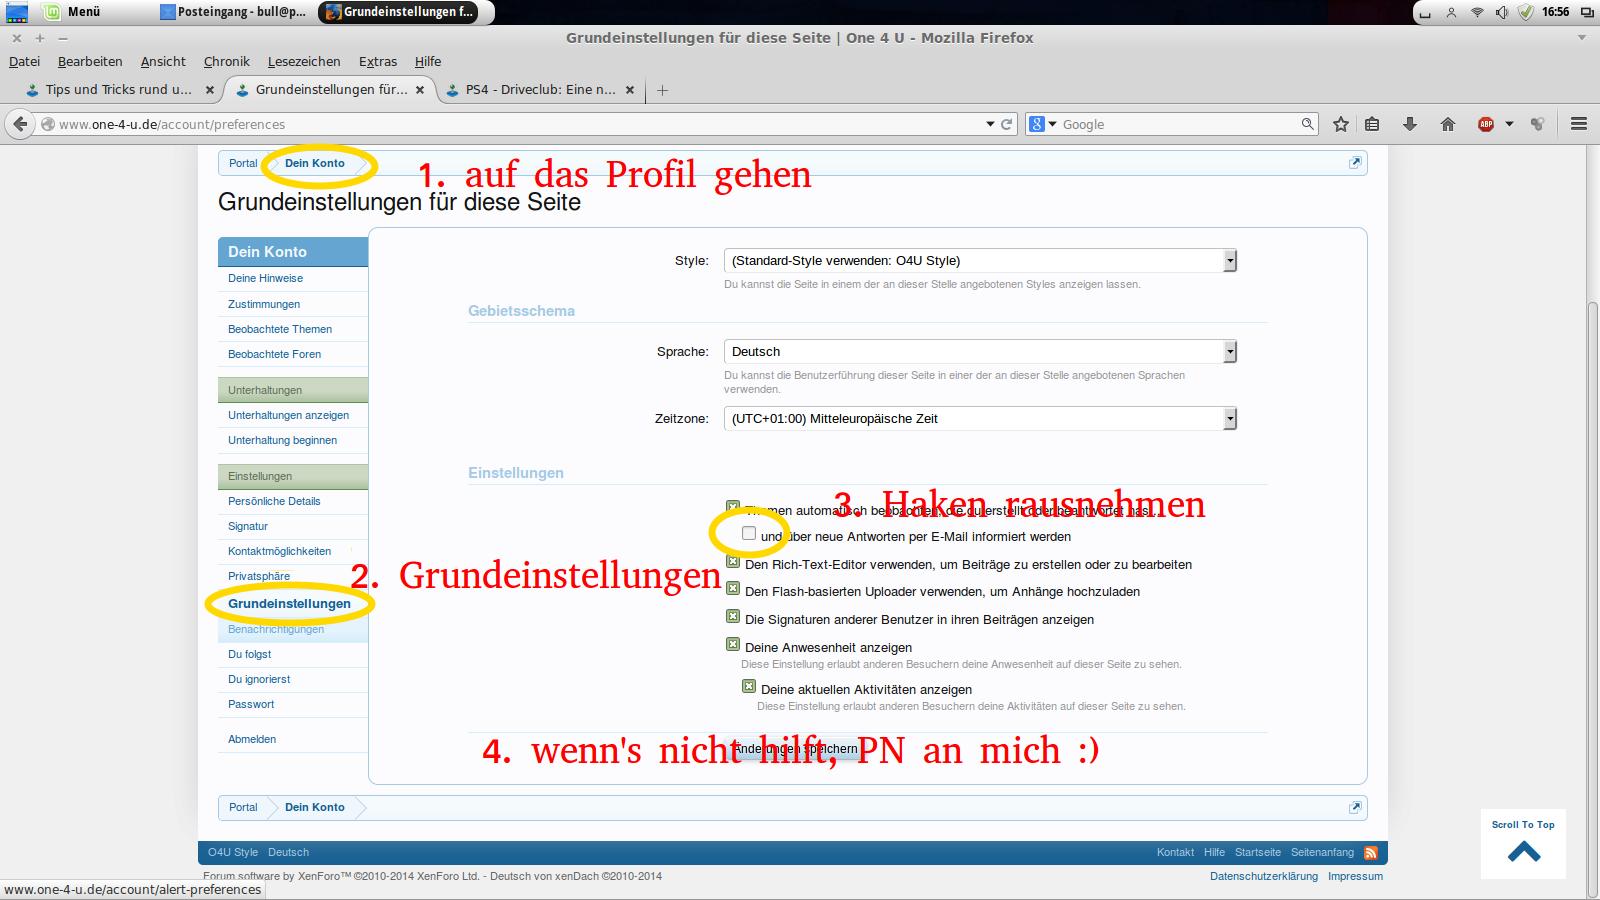 Bildschirmfoto vom 2014-11-06 16:56:01.png